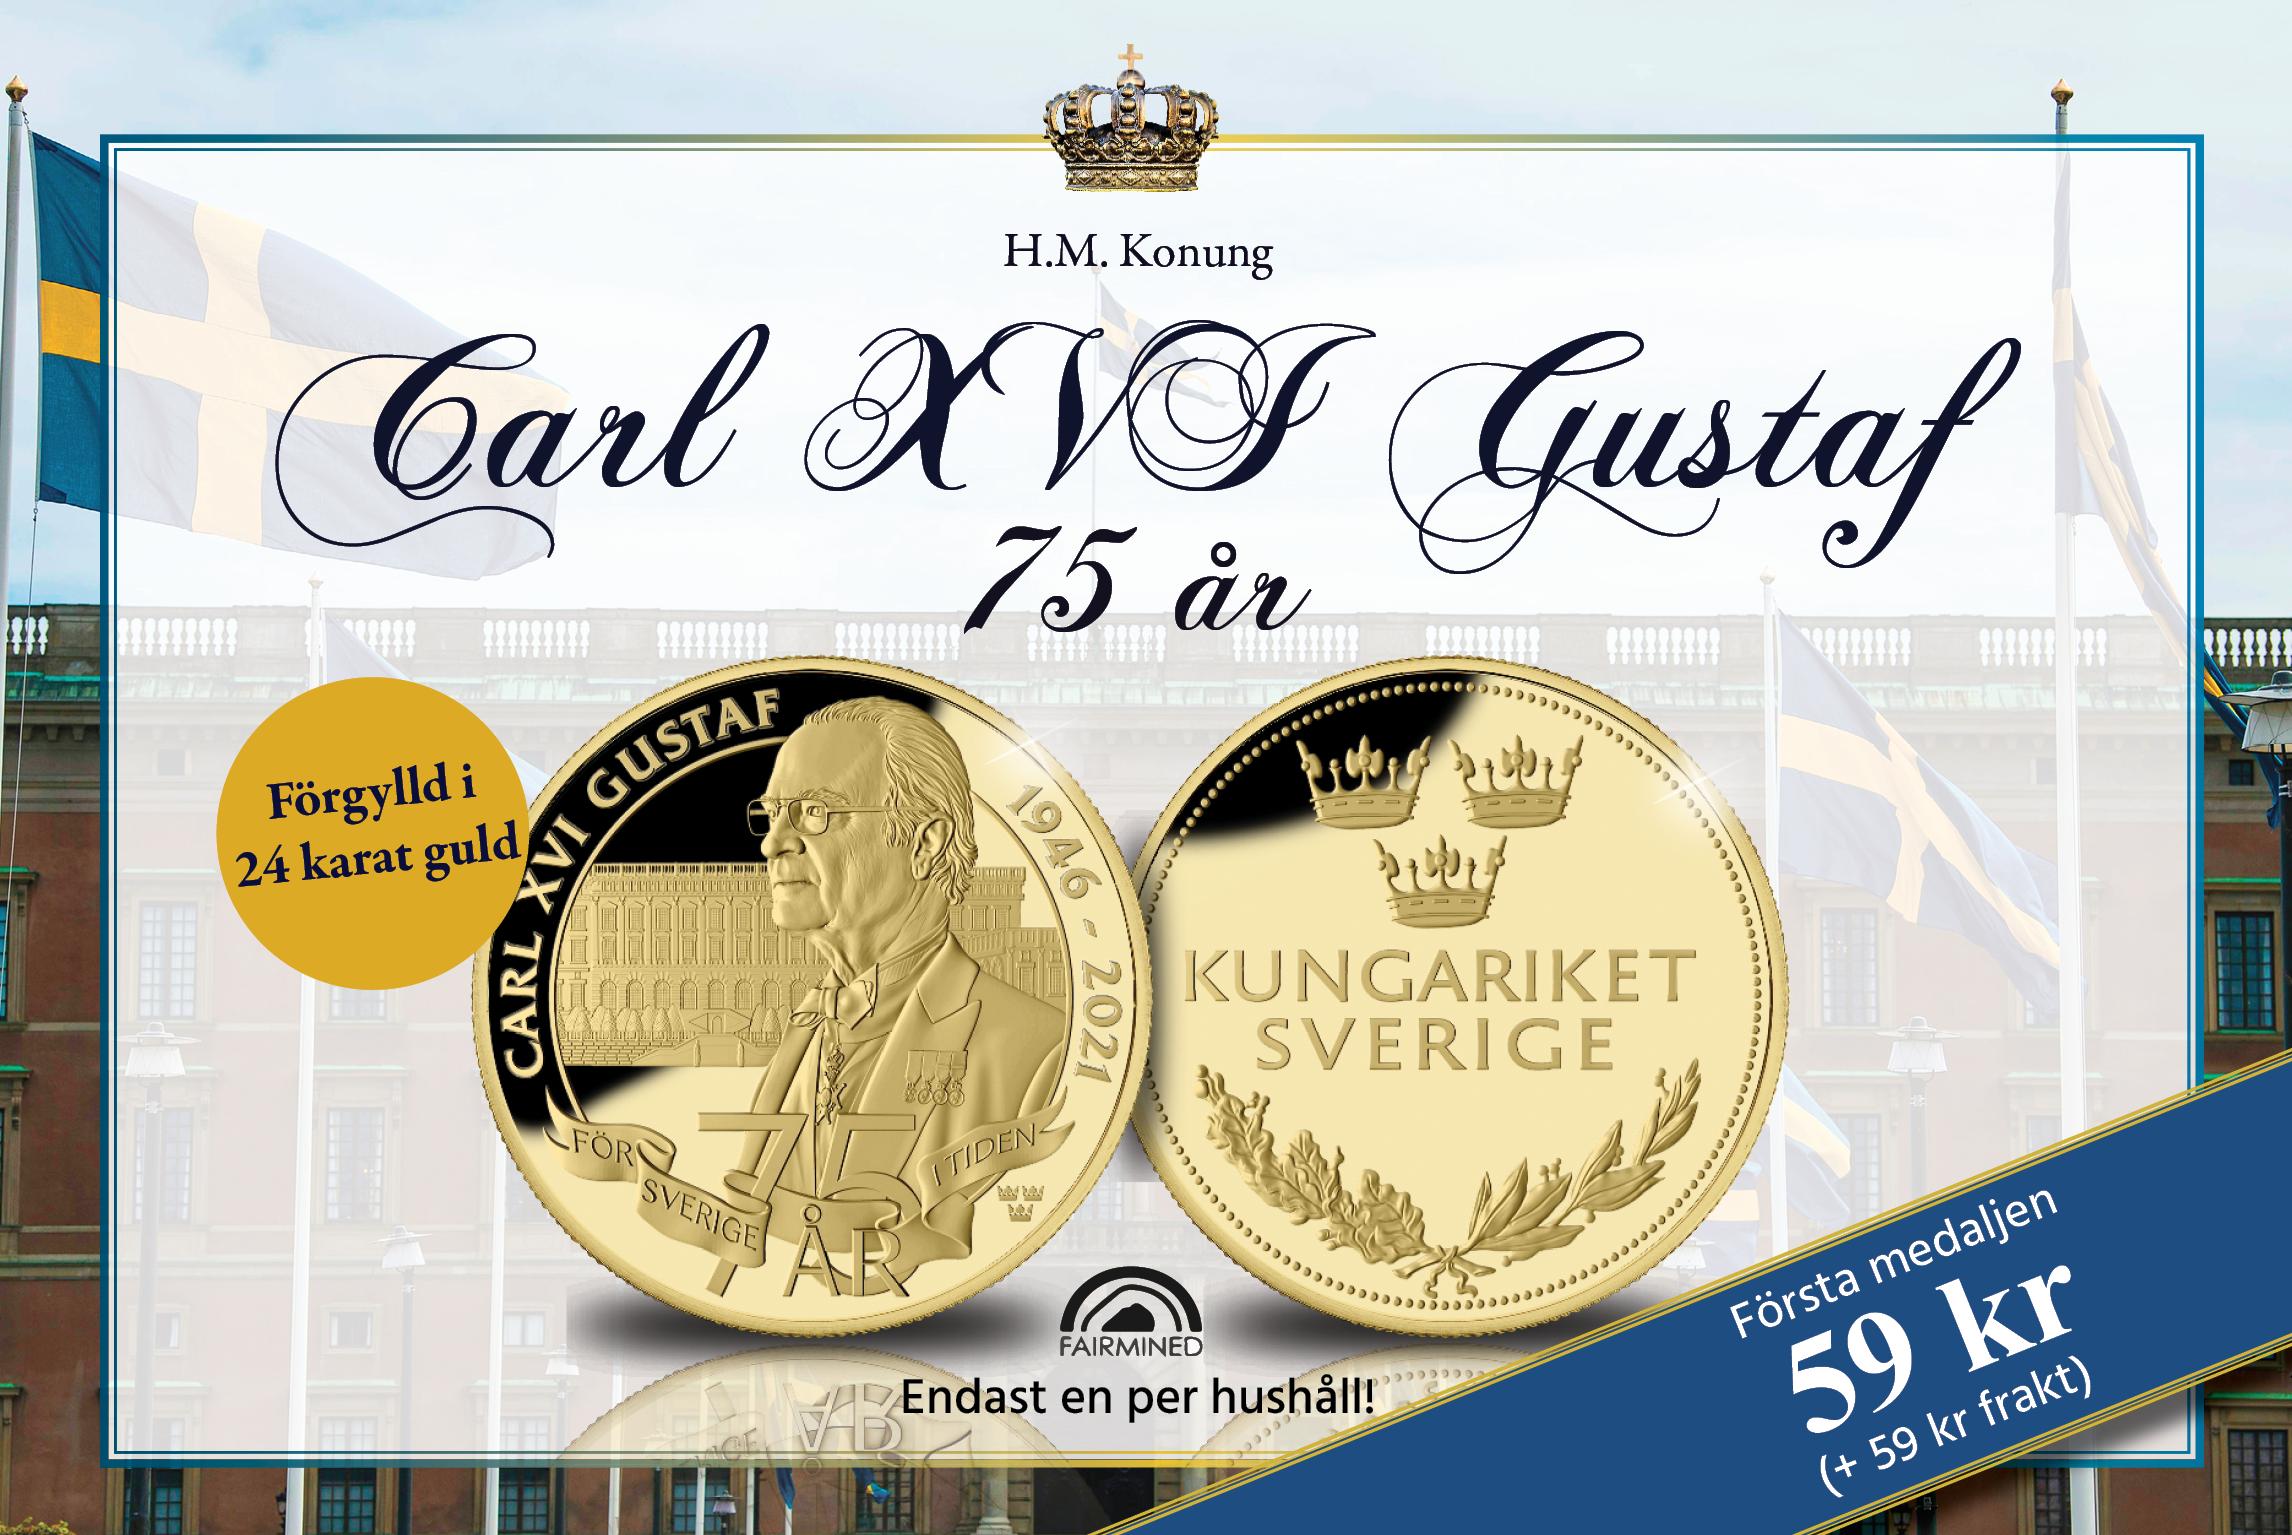 Carl XVI Gustaf 75år